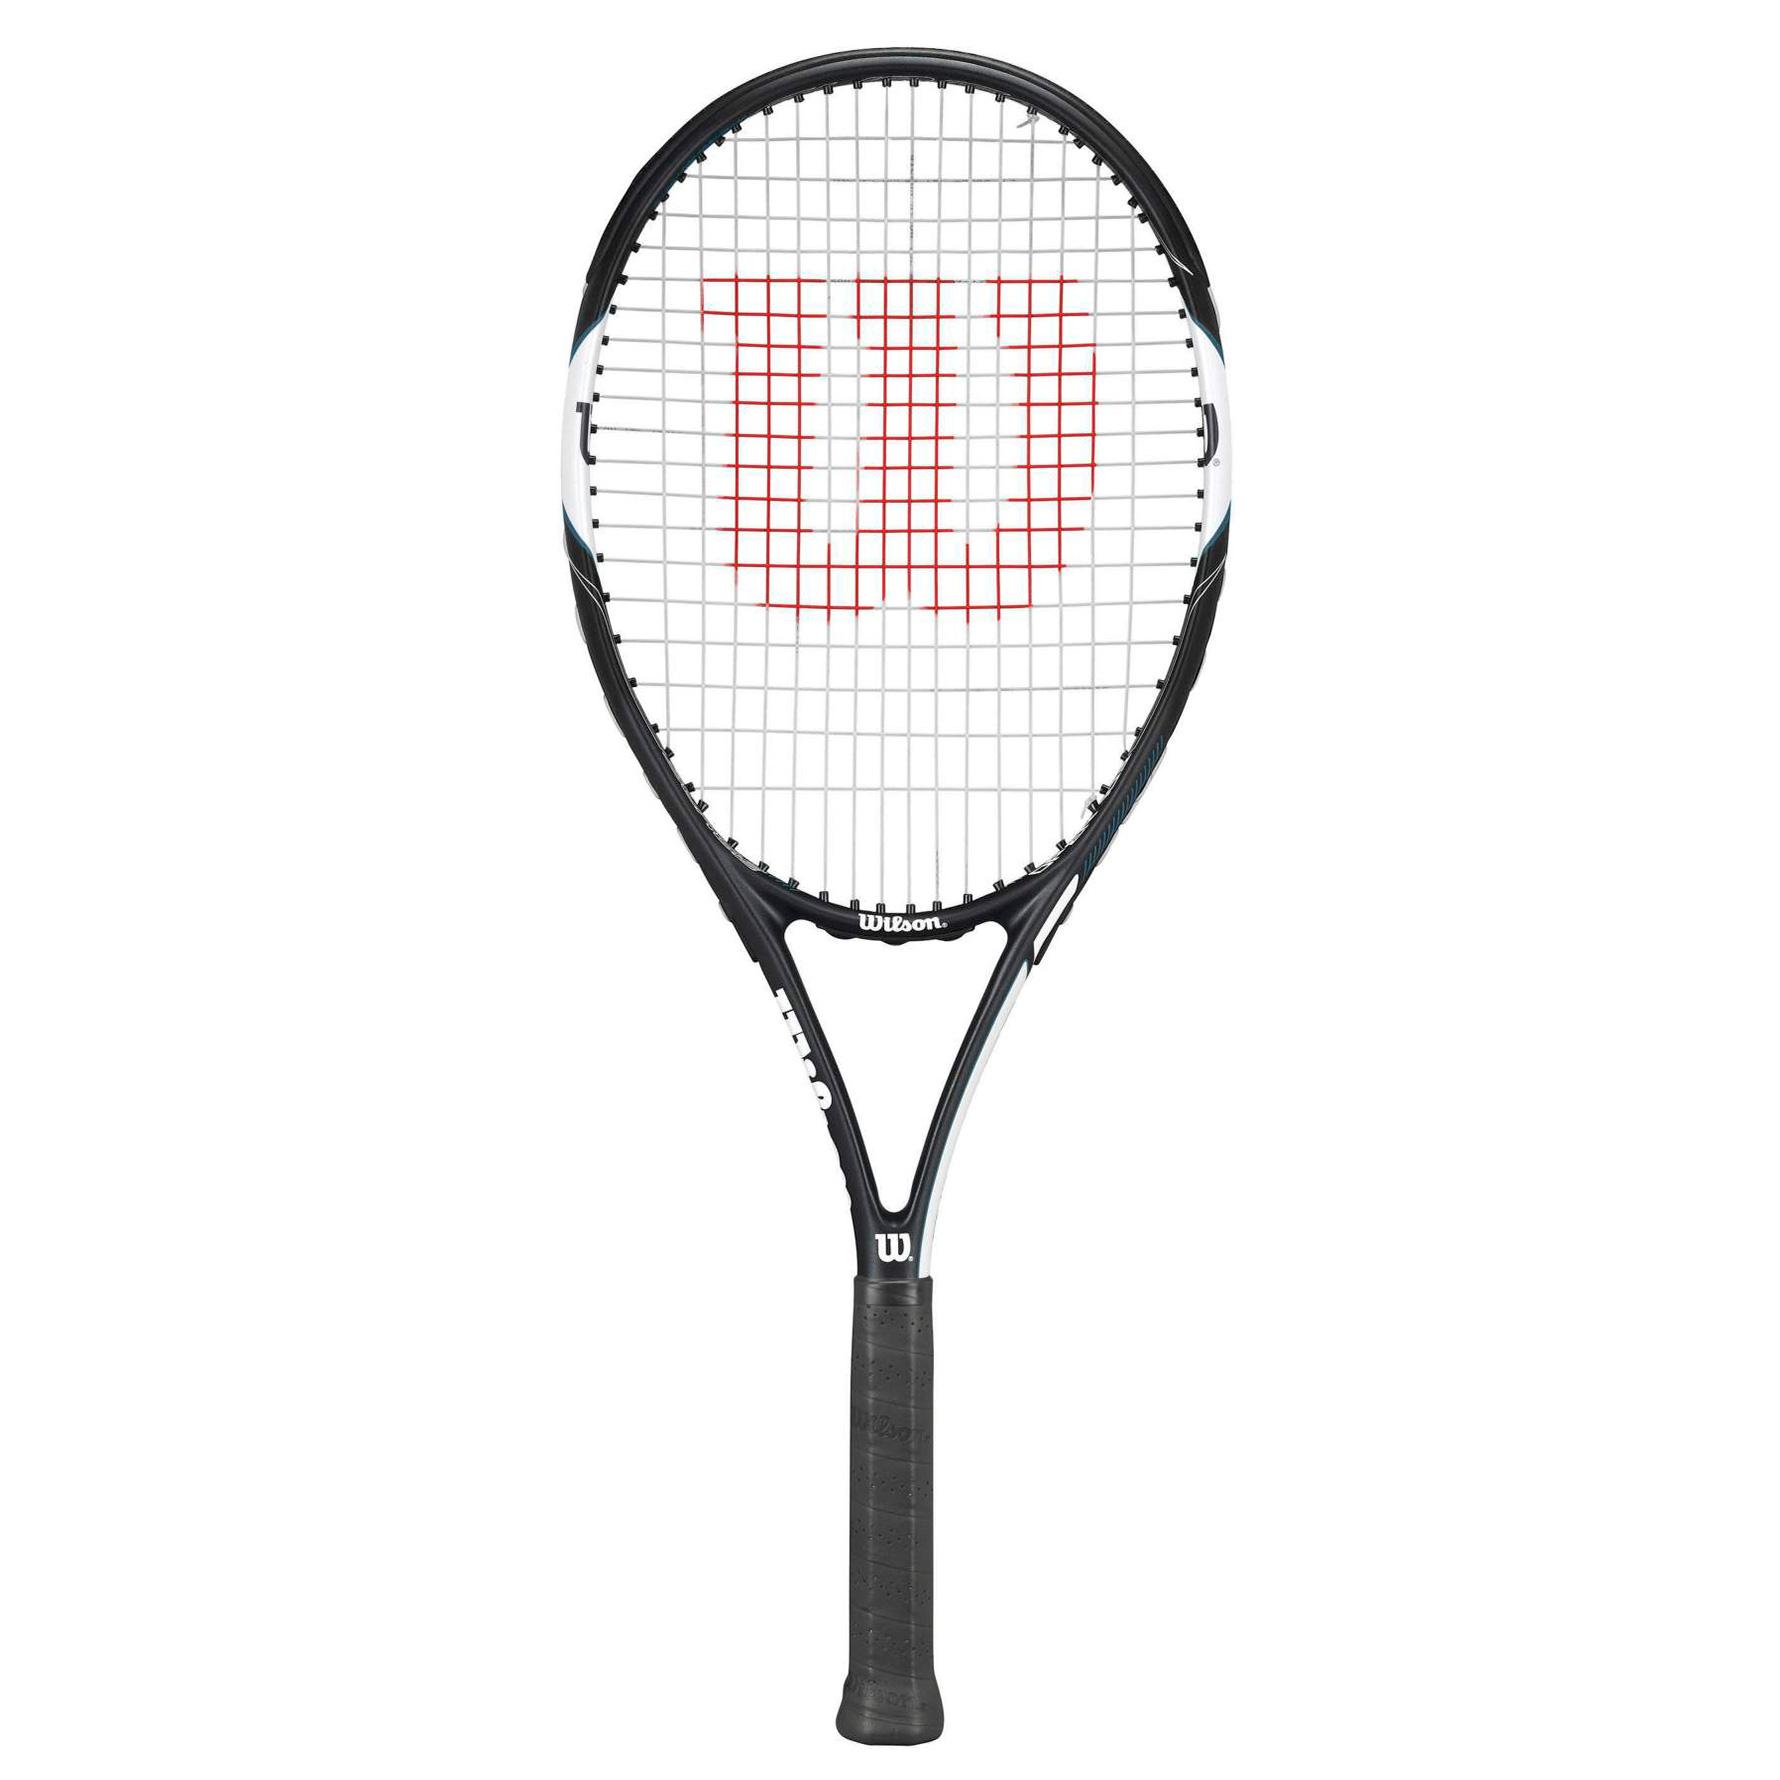 Wilson Tennis Racket Price Comparison Results